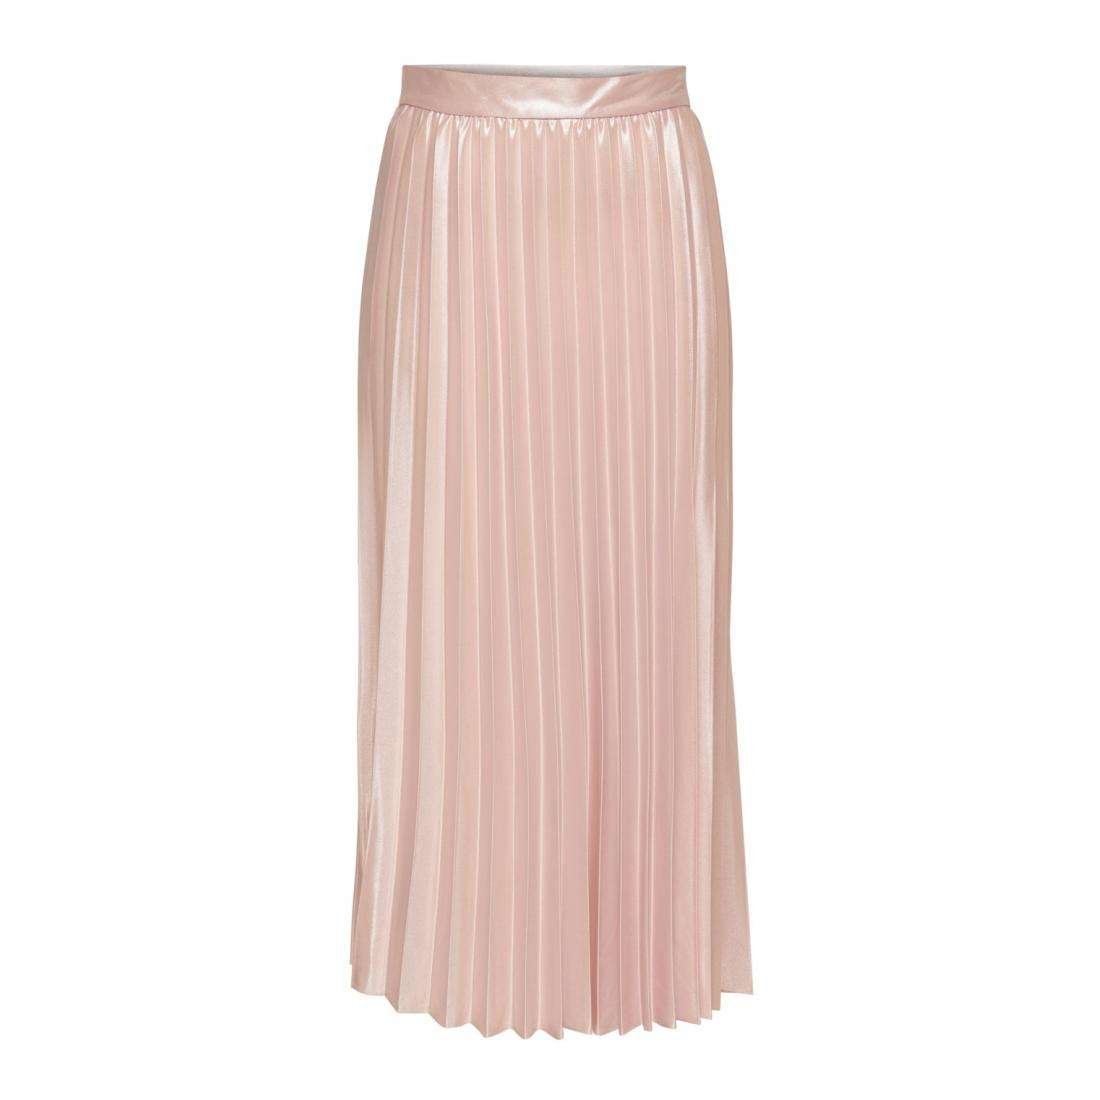 Only andere Kleider/Röcke Damen ONLHAILEY PLEATED SKIRT J